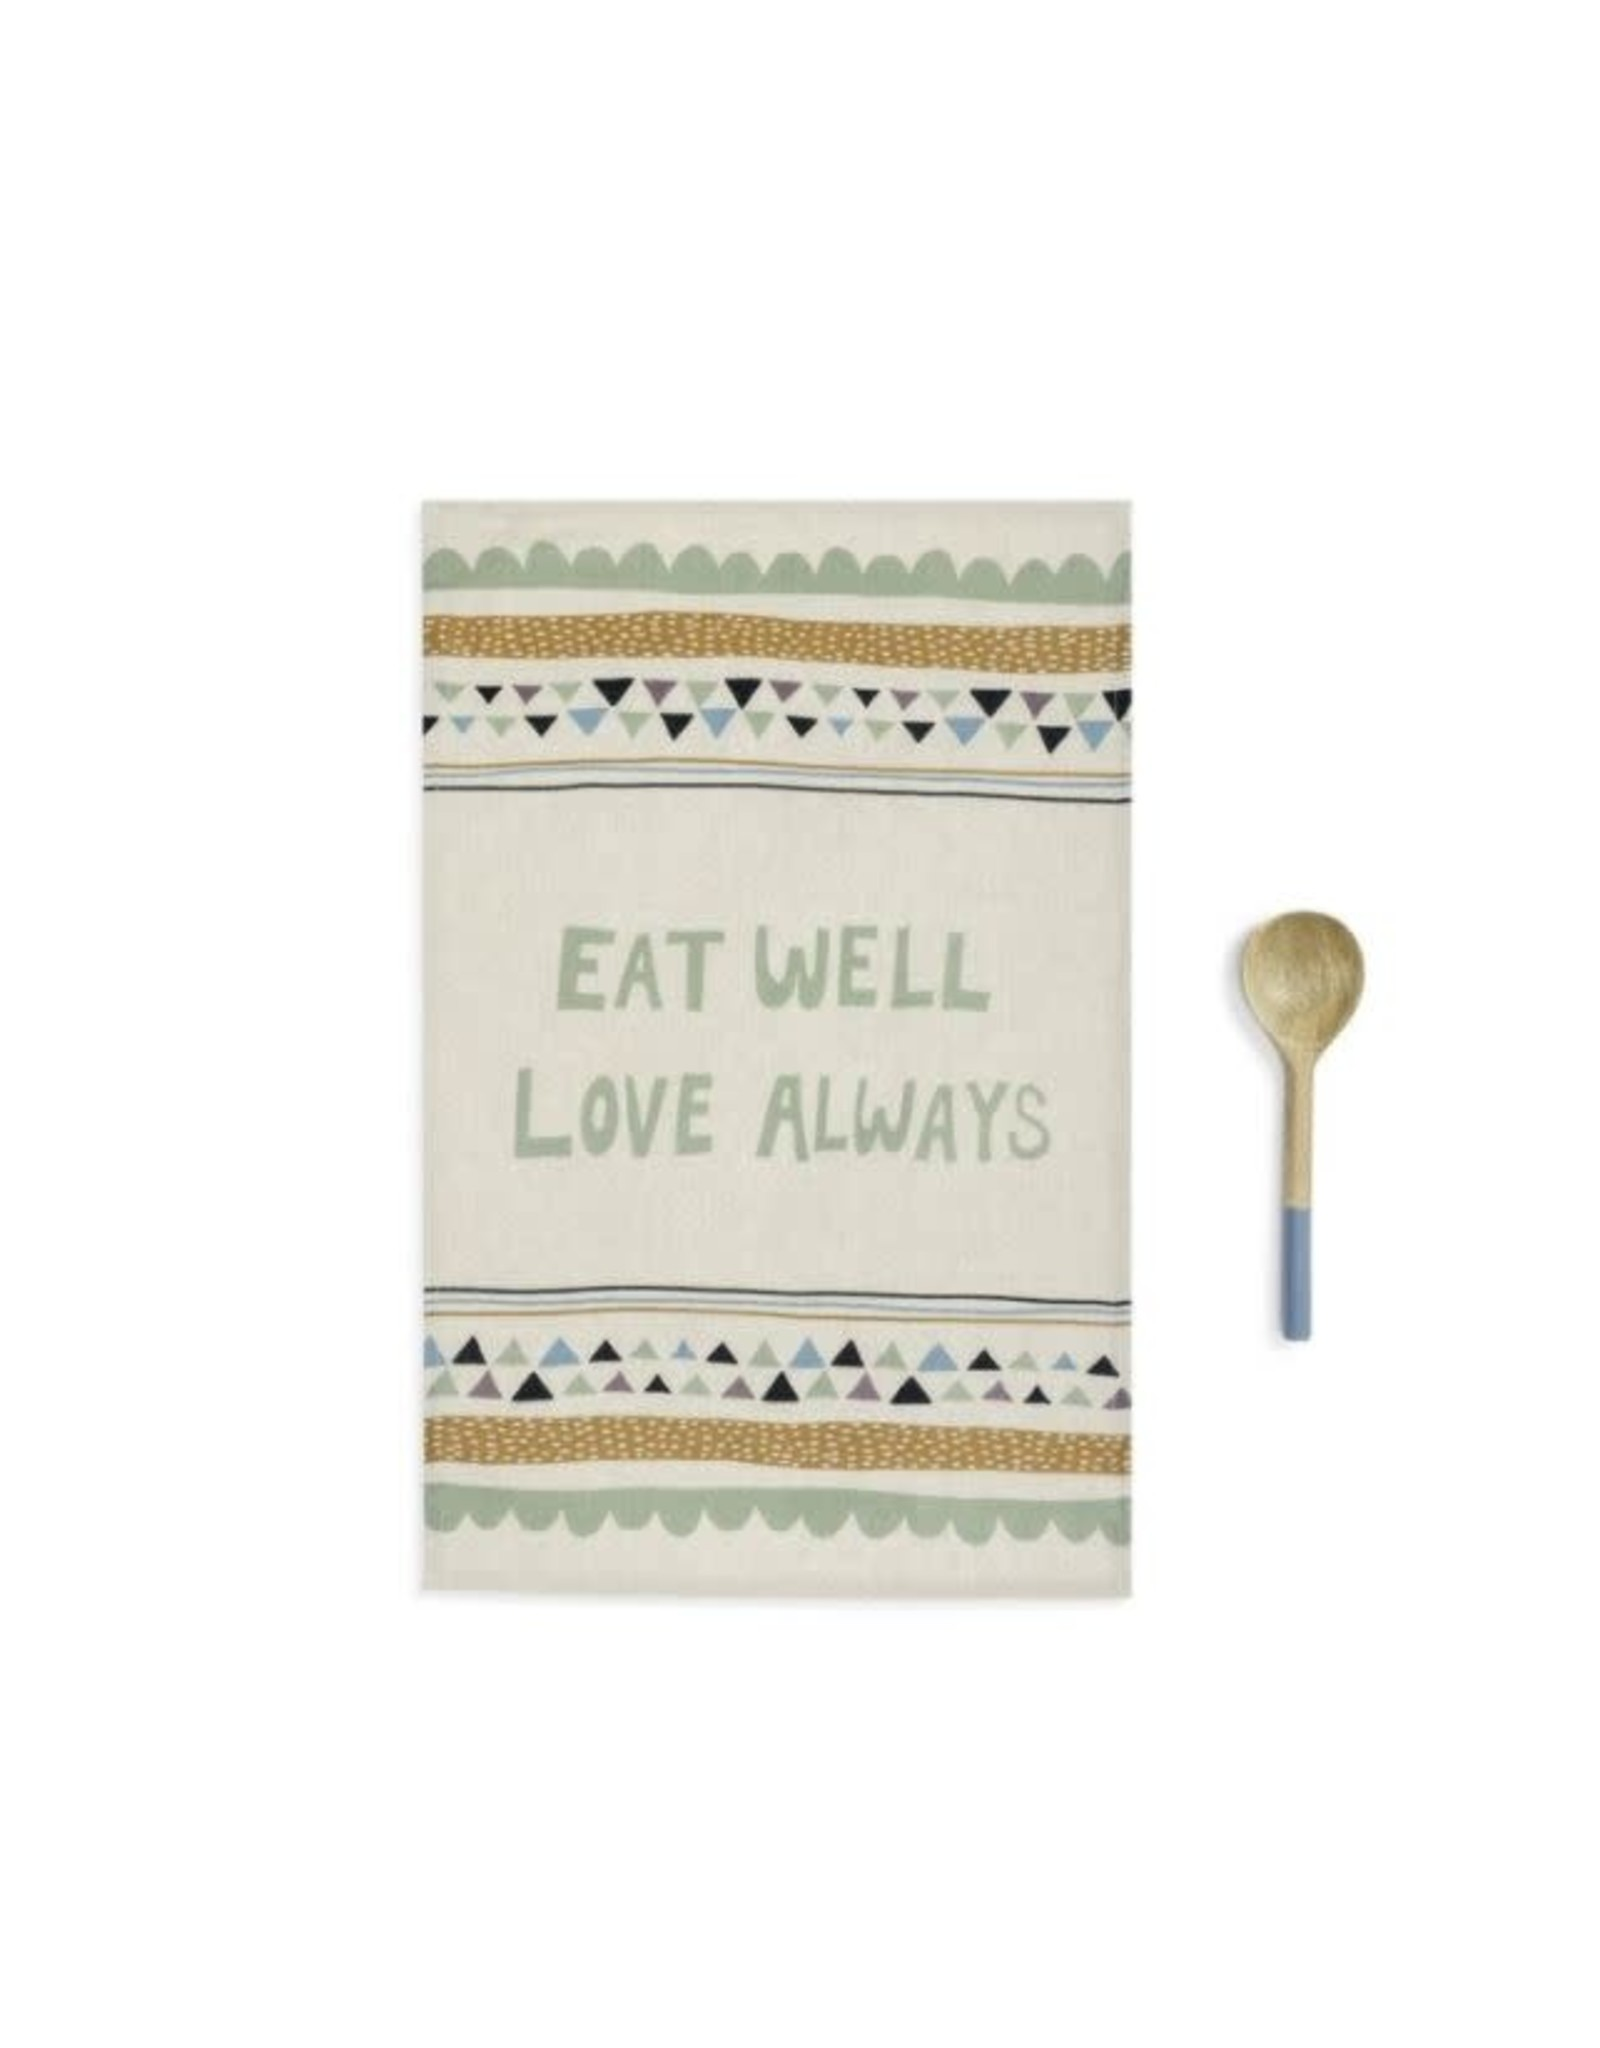 Demdaco EAT WELL KITCHEN TOWEL AND UTENSIL SET